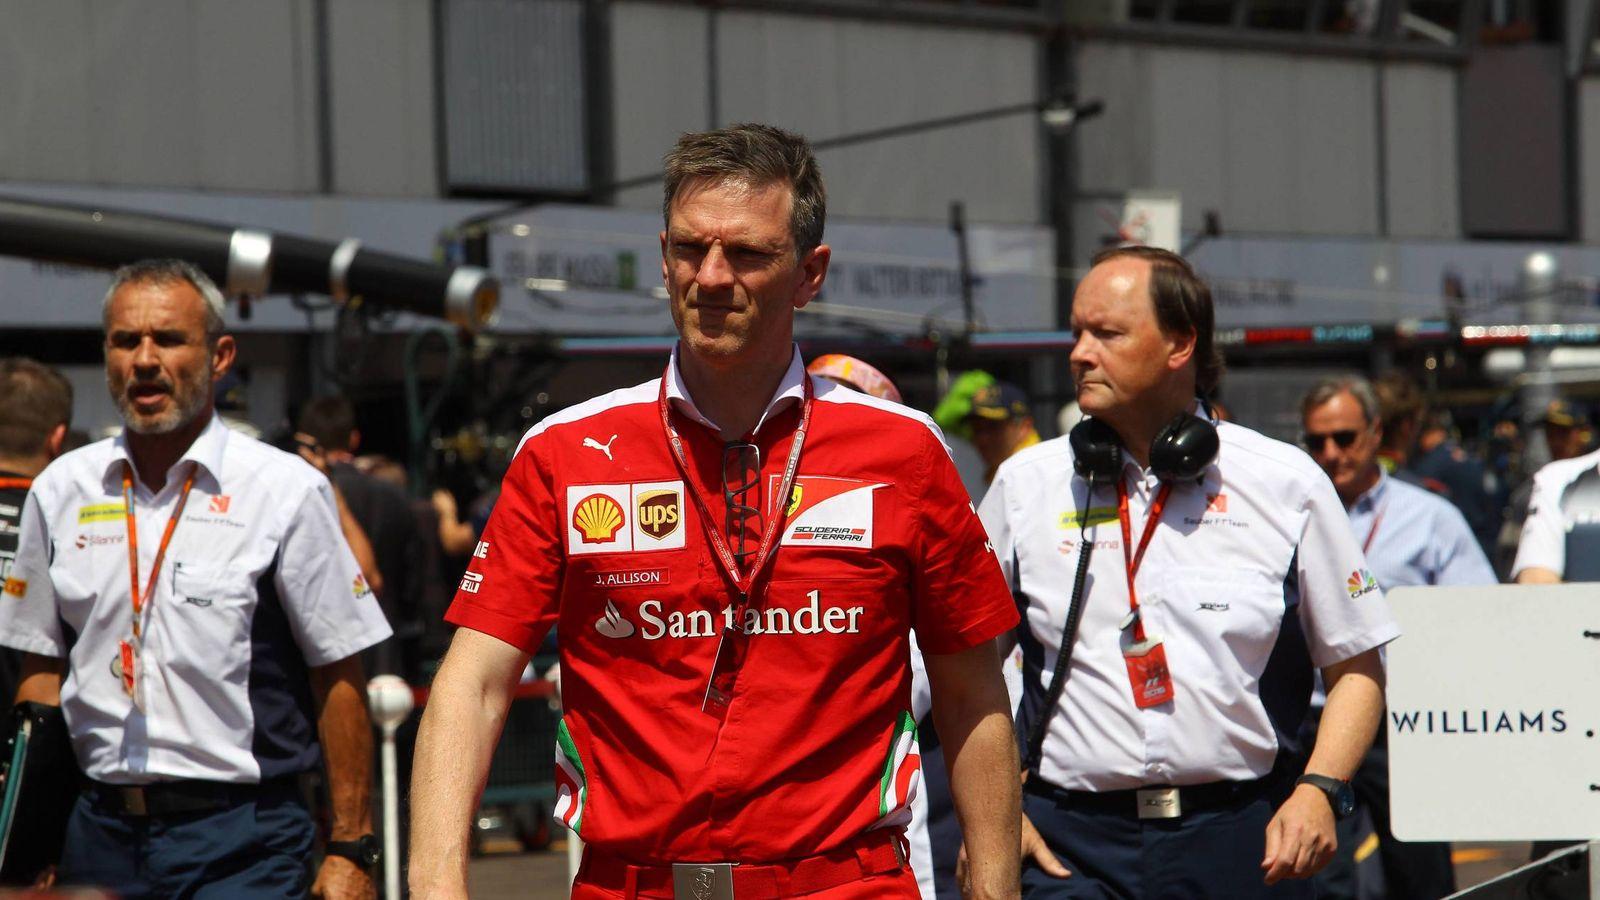 Foto: James Allison, exdirector técnico de Scuderia Ferrari, el GP de Mónaco de este año.